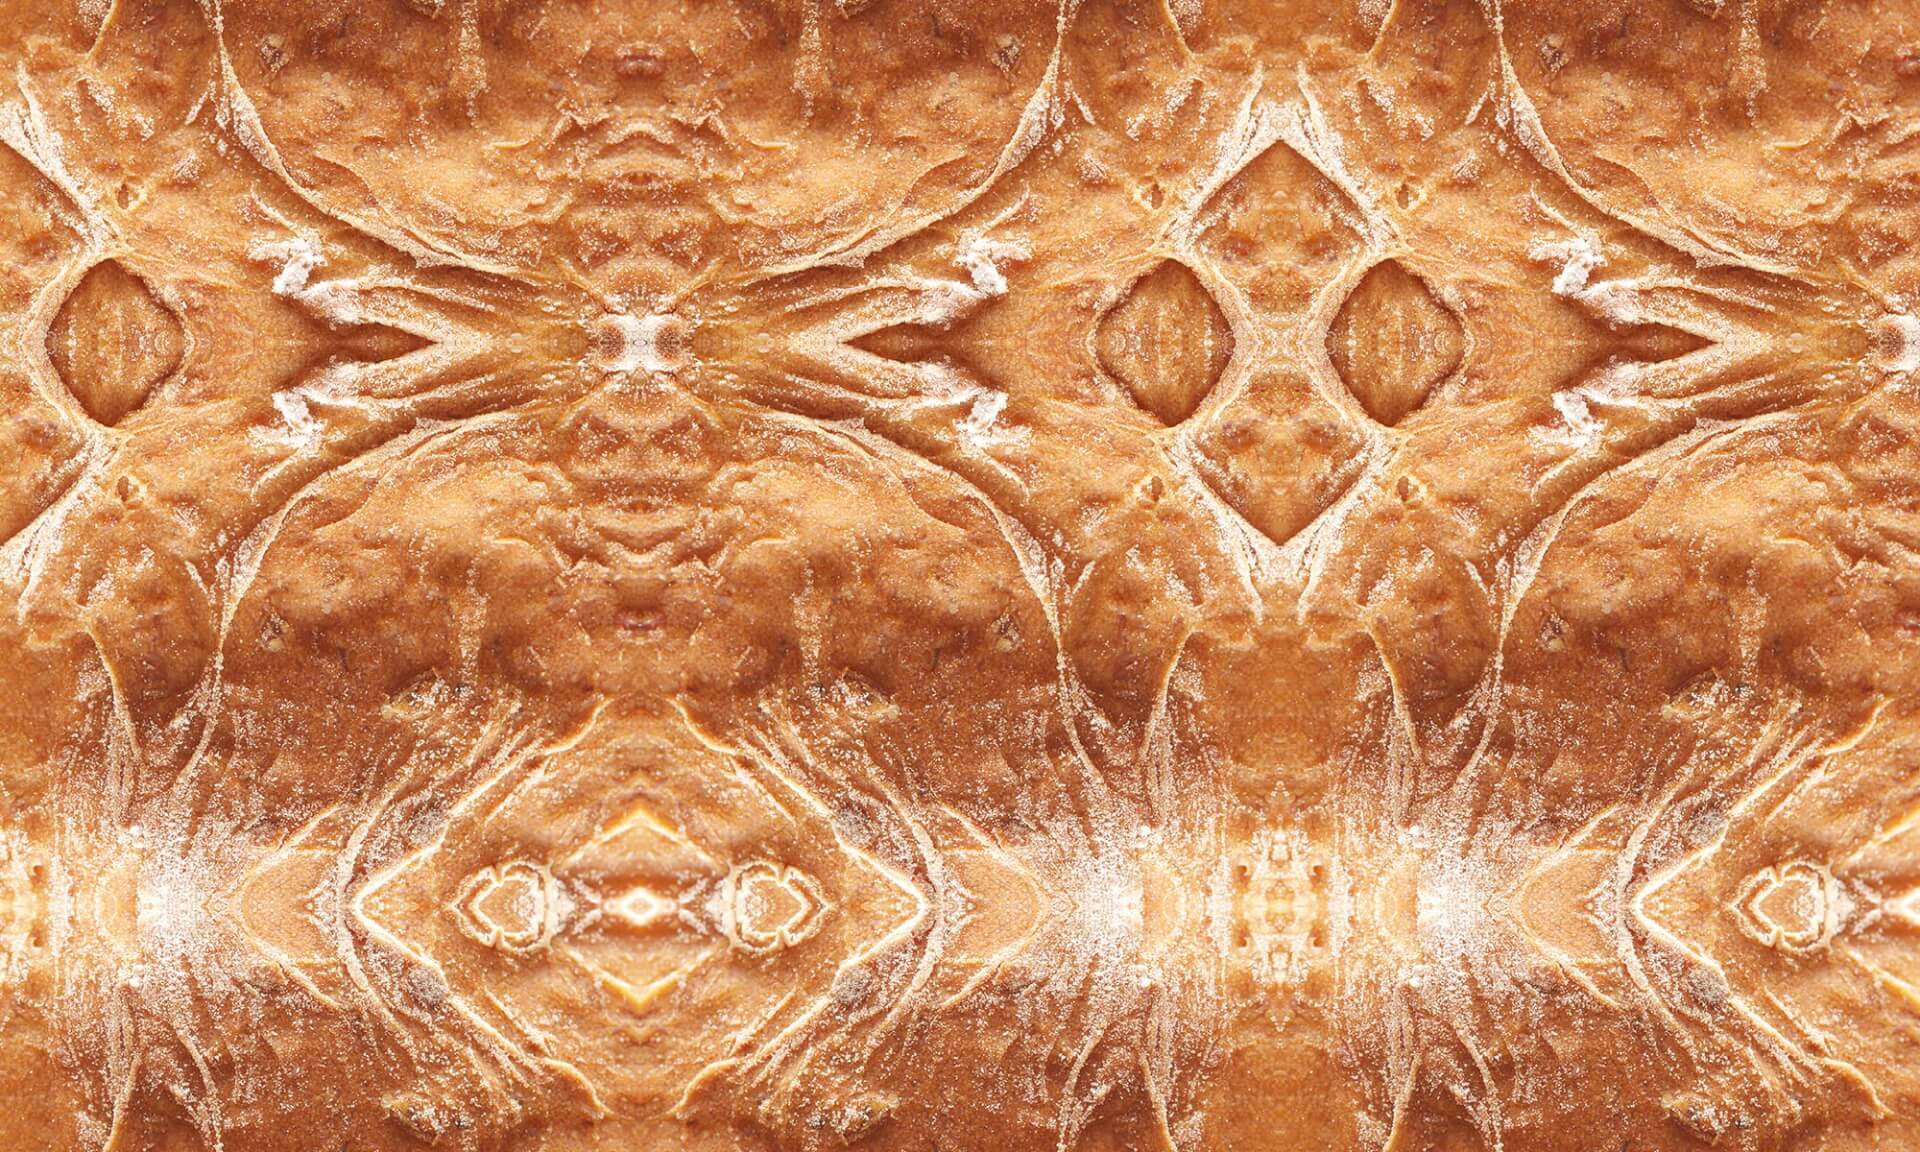 Southwestern Spun (Bread-9) Doug Garrabrants